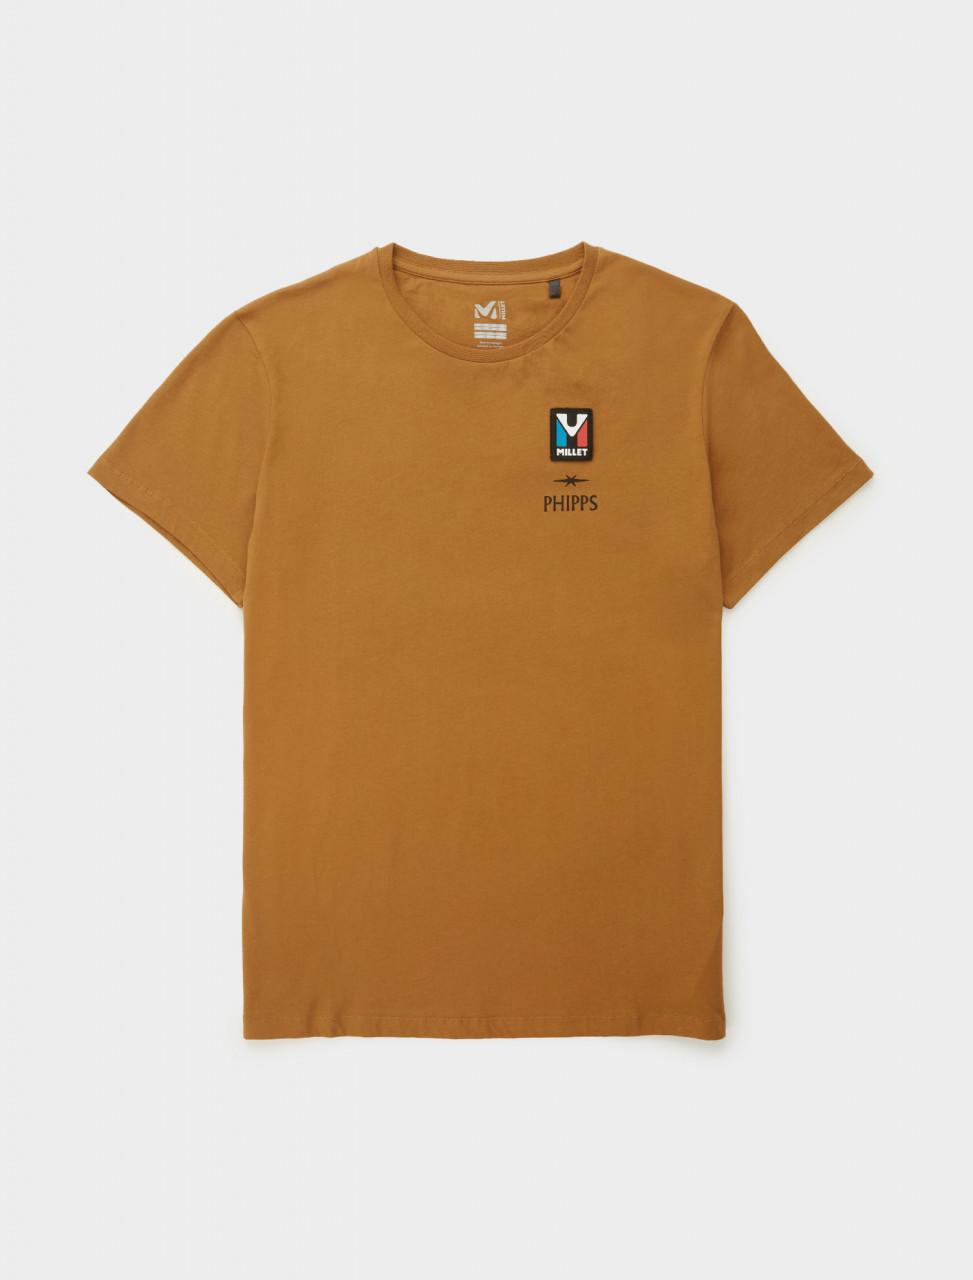 Phipps x Millet Printed Short Sleeve T-Shirt